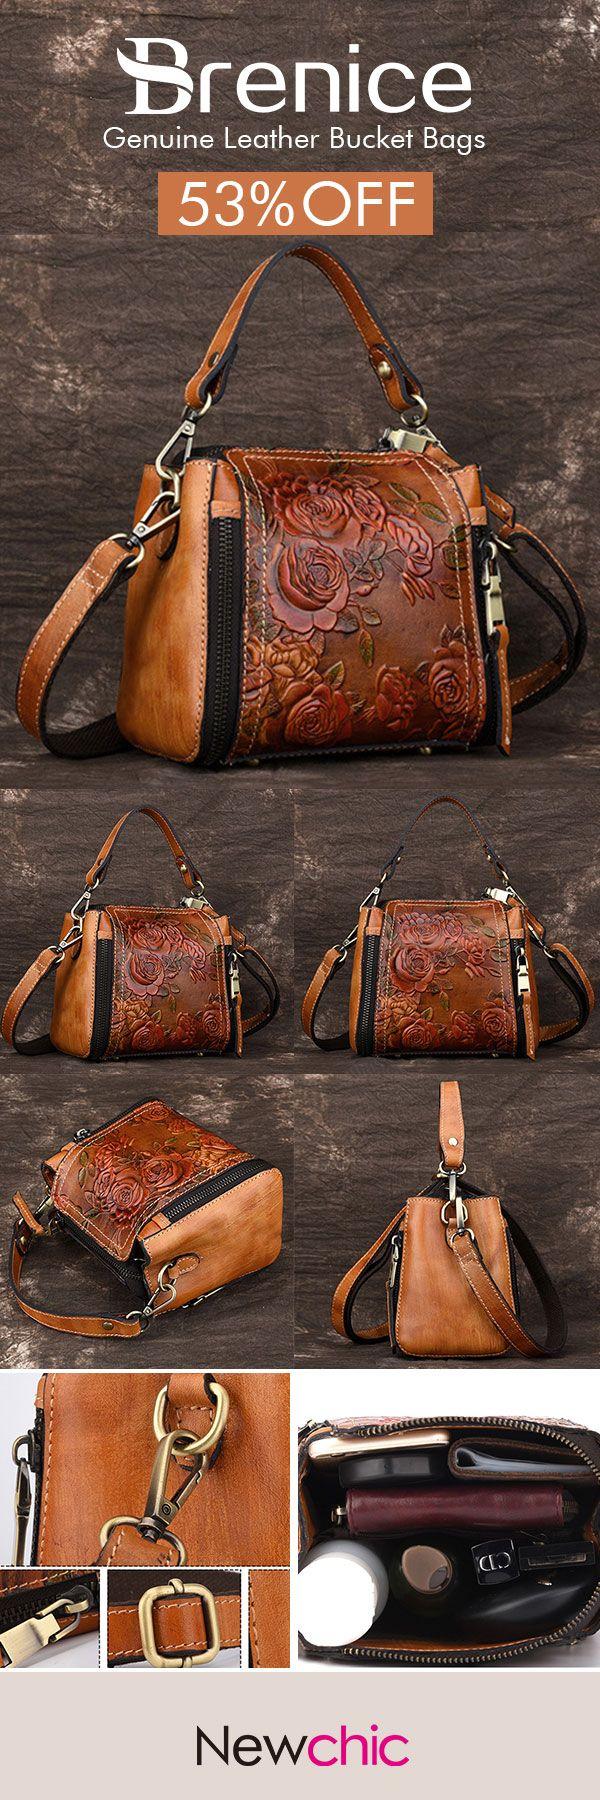 e04a52bee140  52%OFF  Brenice New Retro Genuine Leather Bucket Handbag Hand Embossed  Craft Flower Crossbody bag